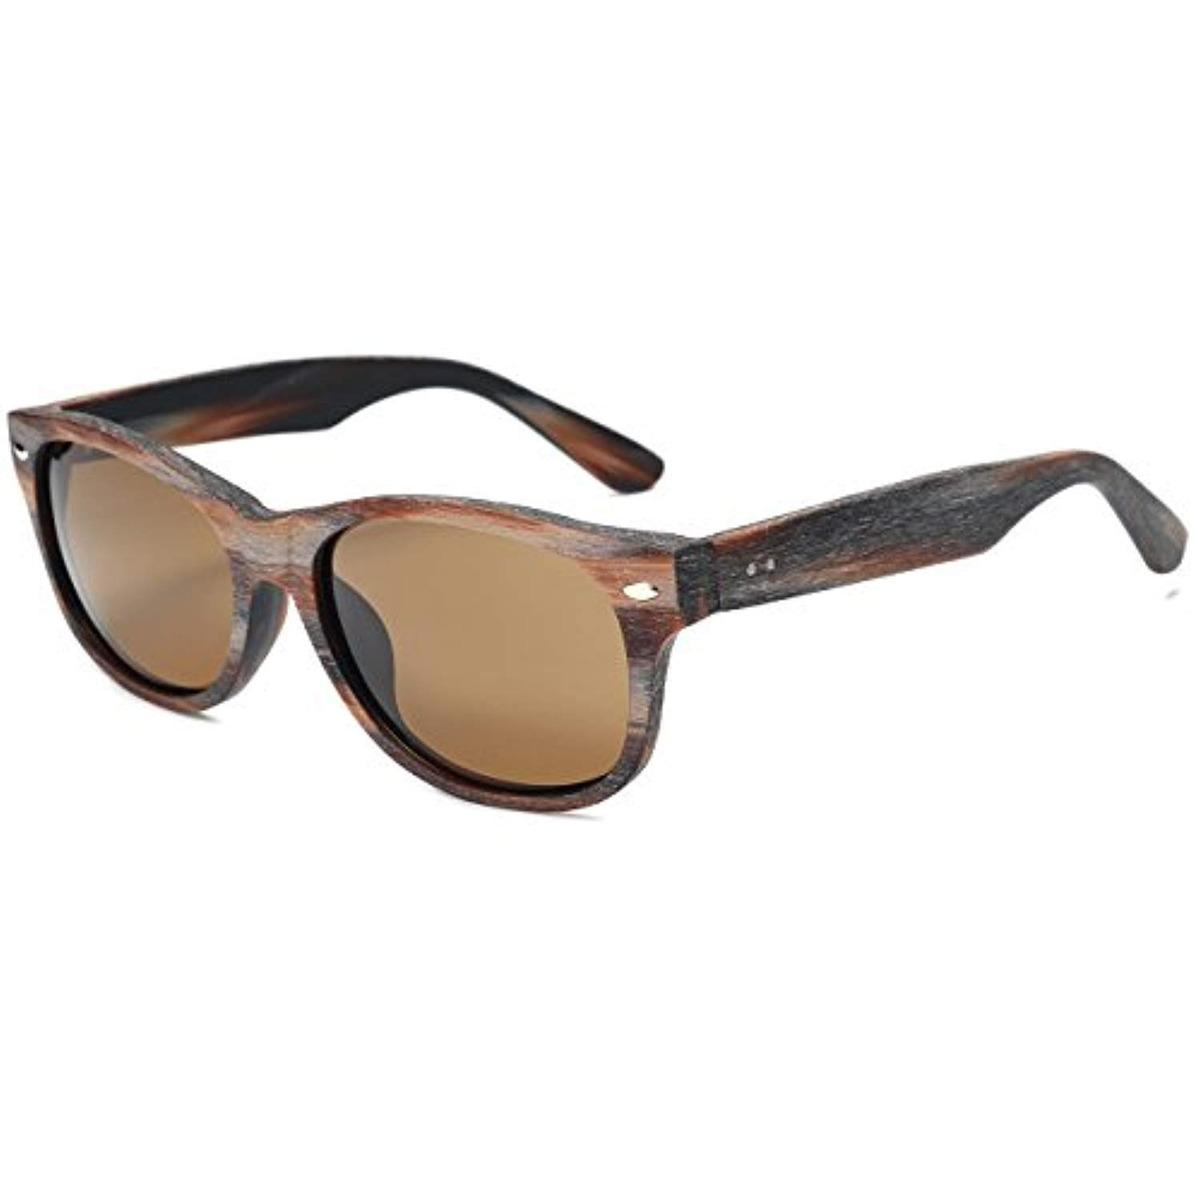 b3541b1e49 Baviron Gafas De Sol Madera Del Grano Similares - $ 135.533 en ...